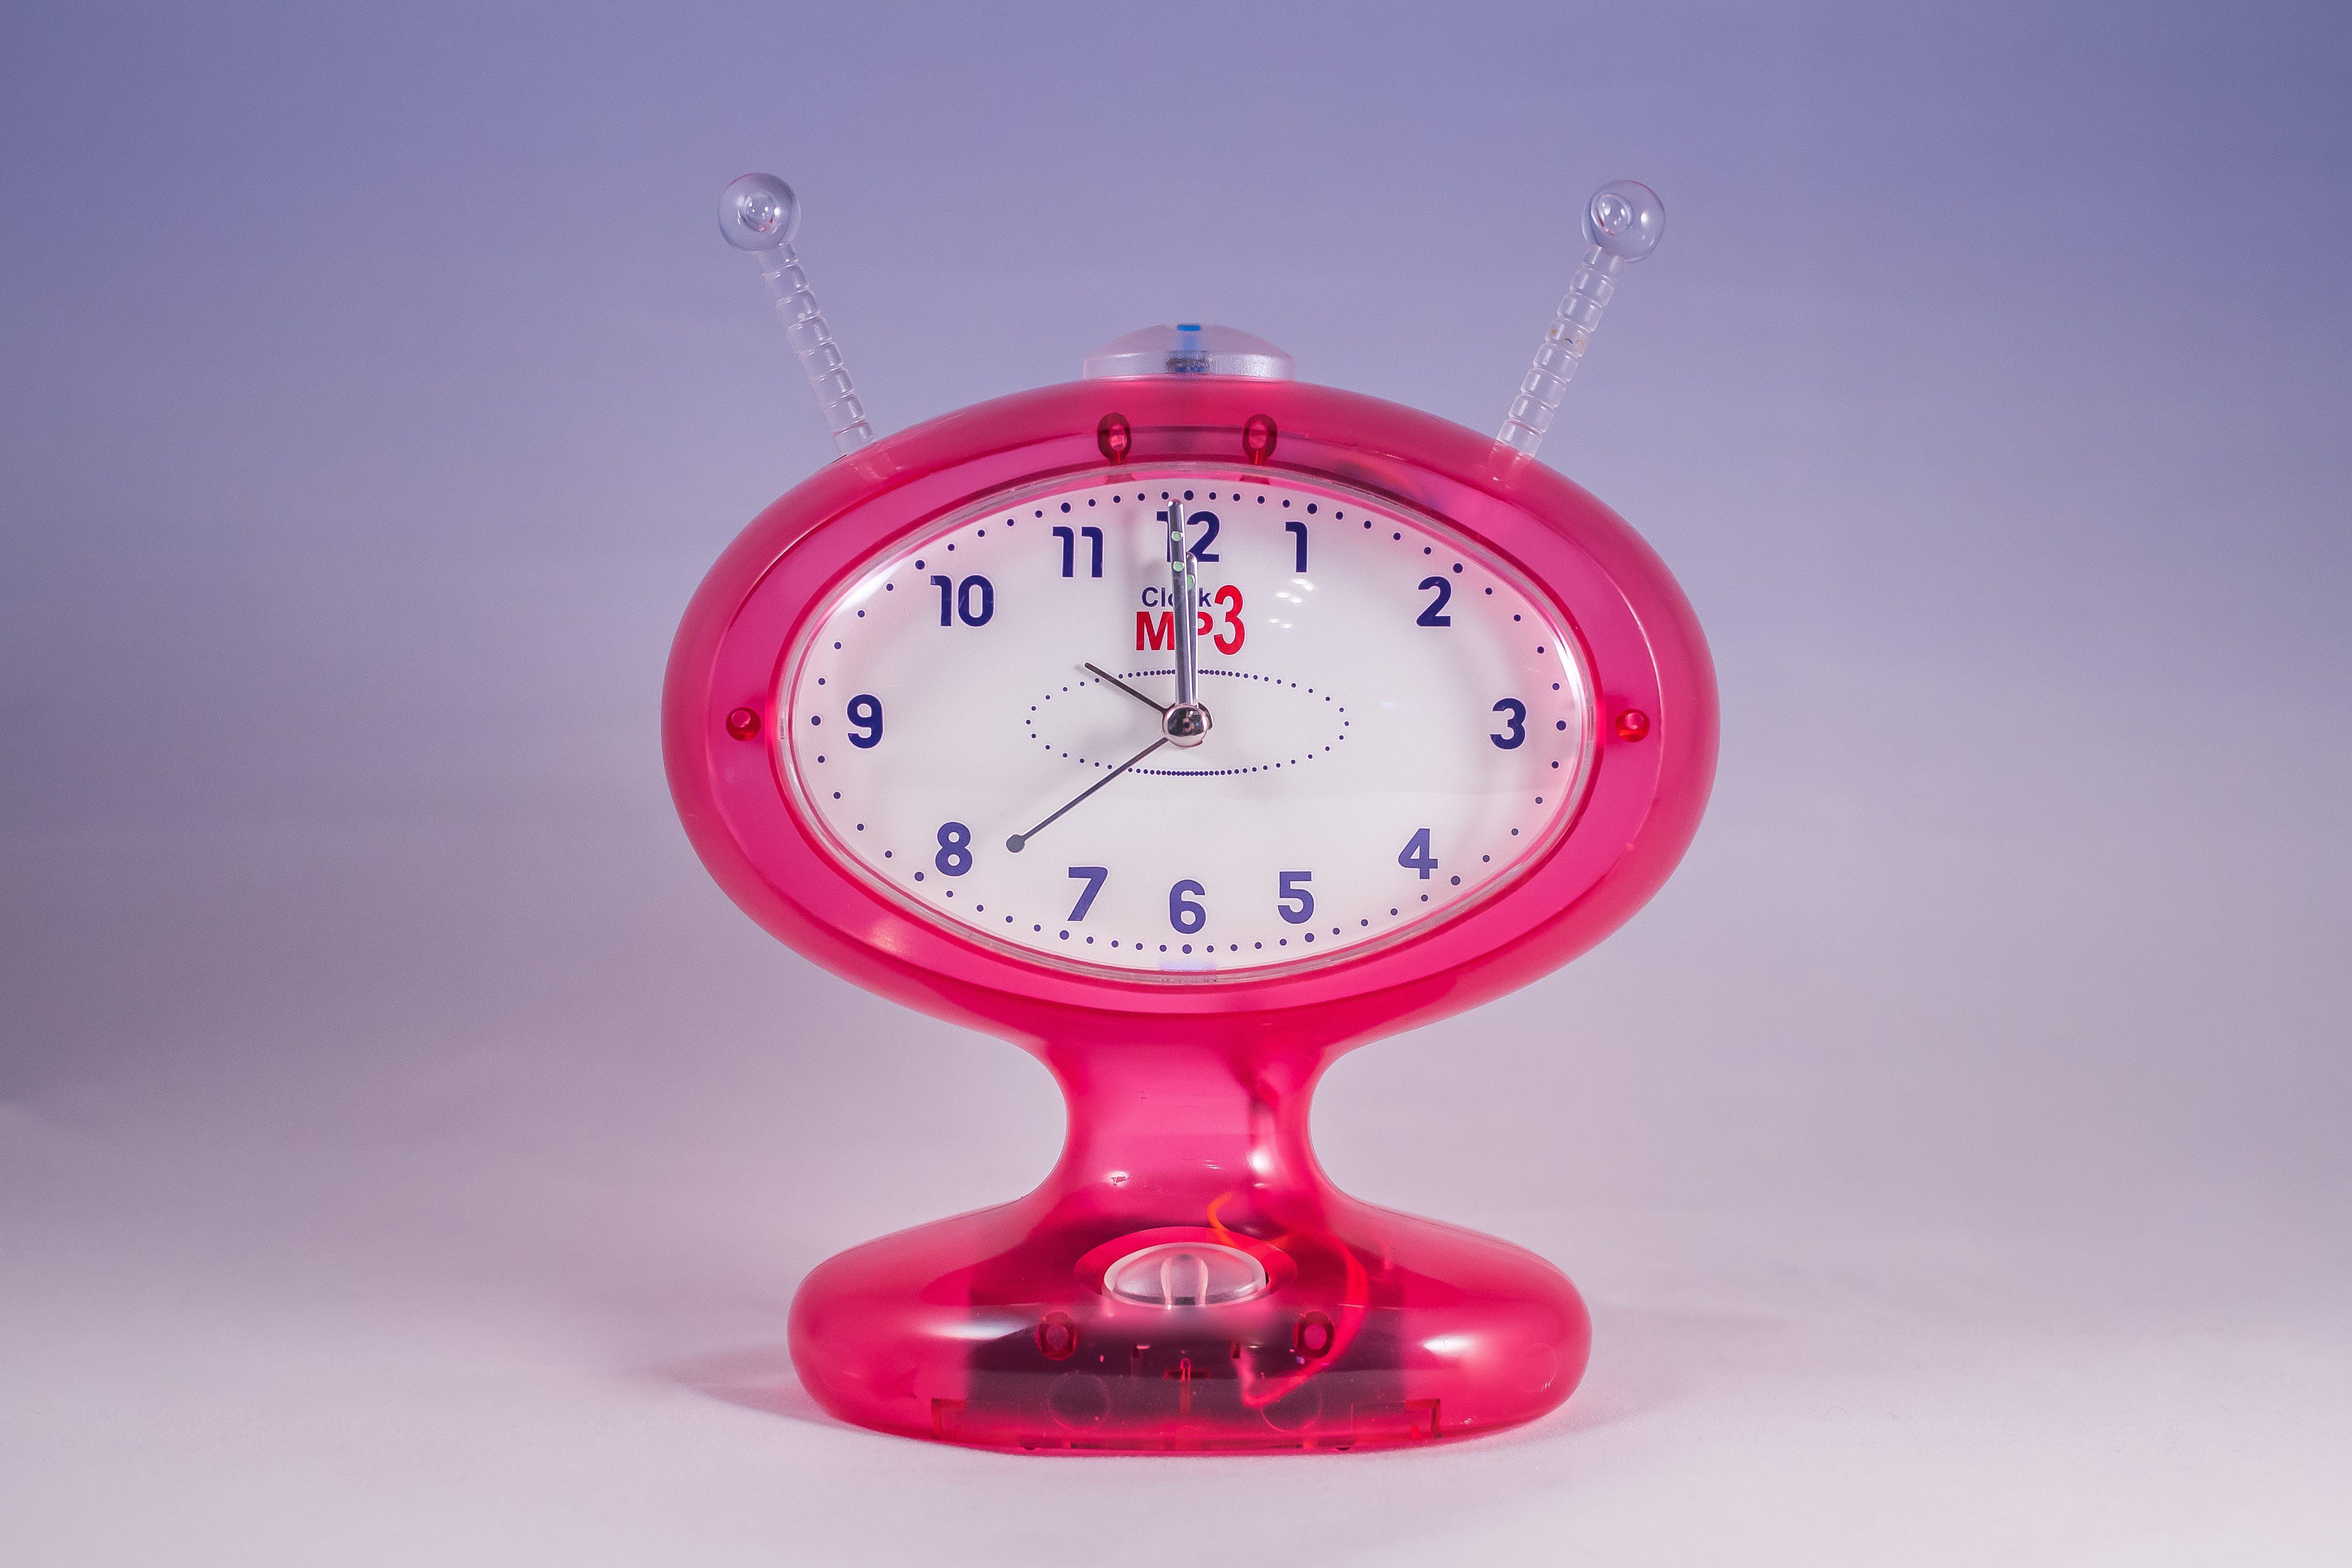 Pink and White Mp3 Analog Clock Displaying at 12:00